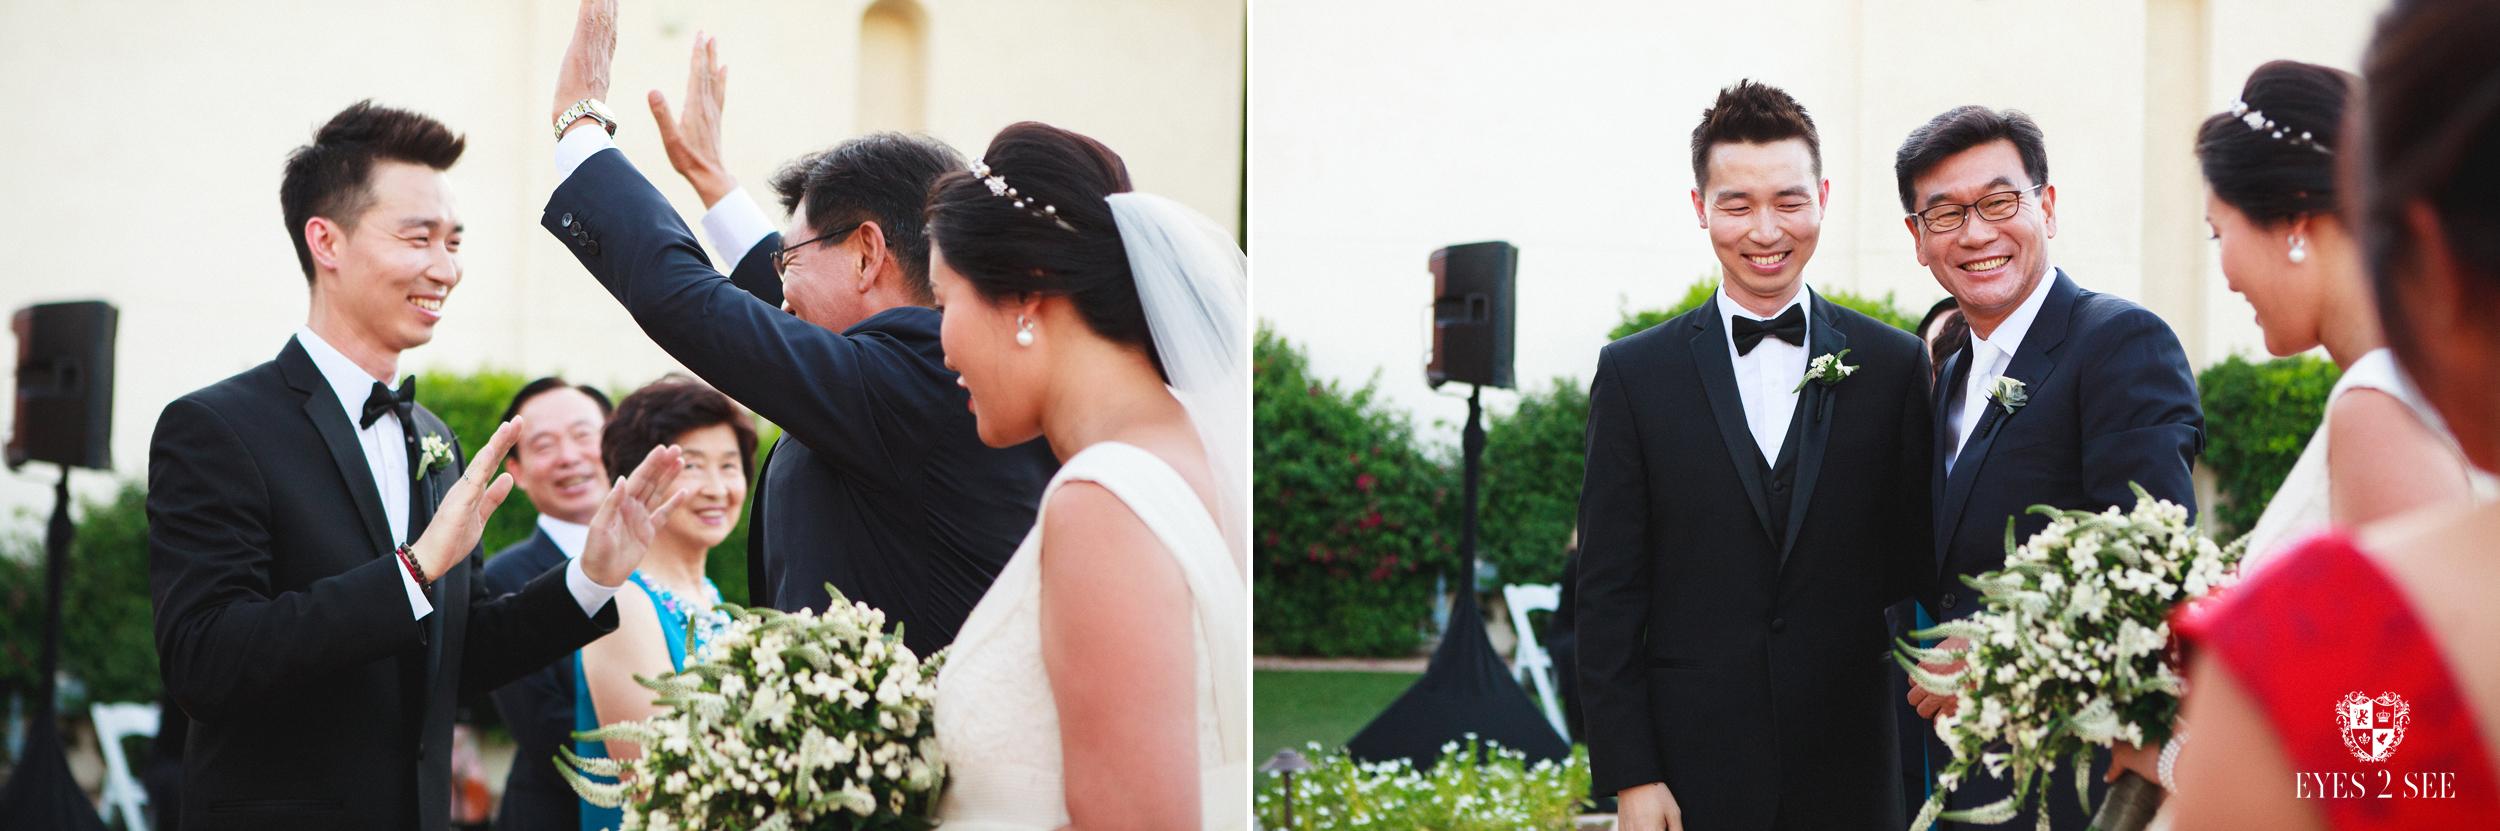 Yongrok_Jeanne_Wedding_Photography042.jpg